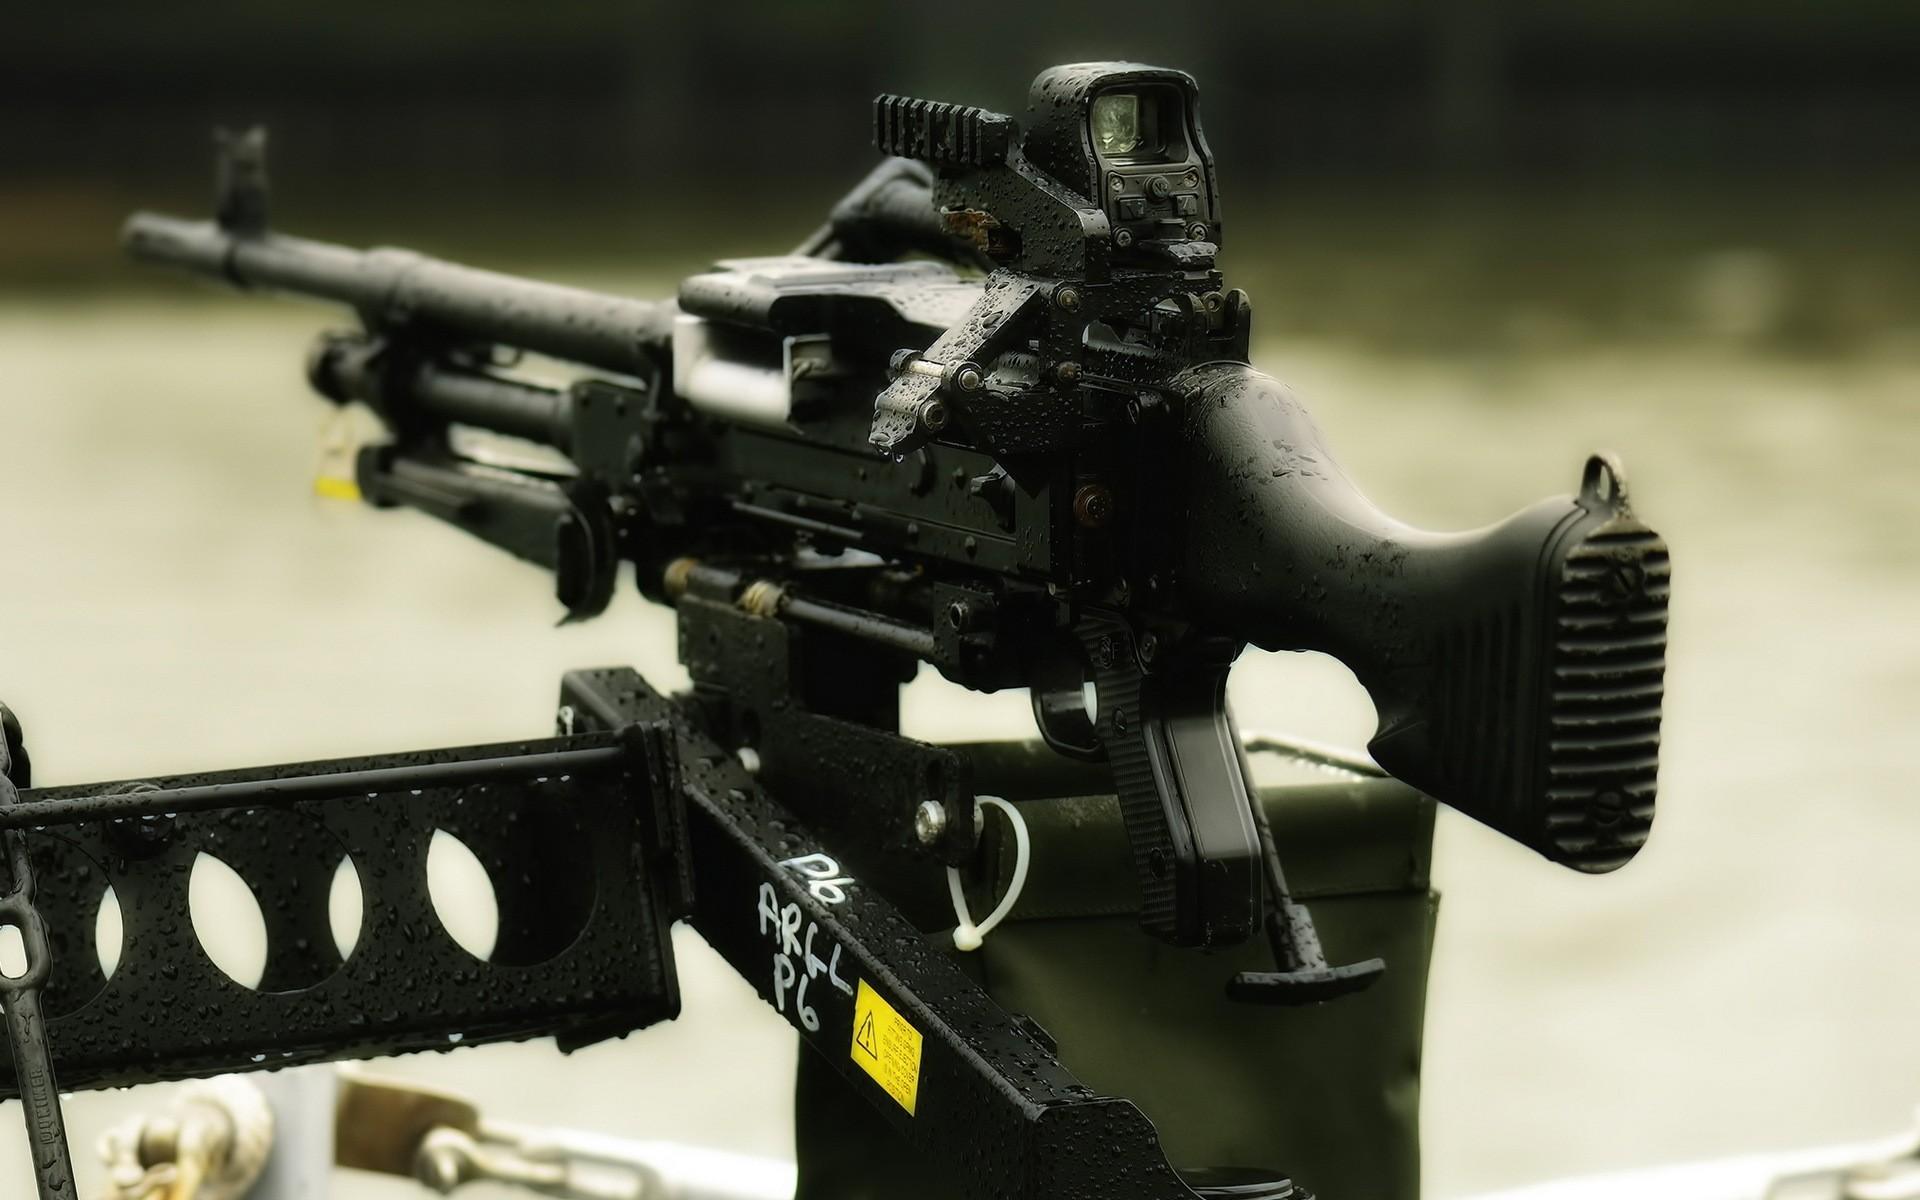 Sniper Rifle Wallpaper 1920x1200